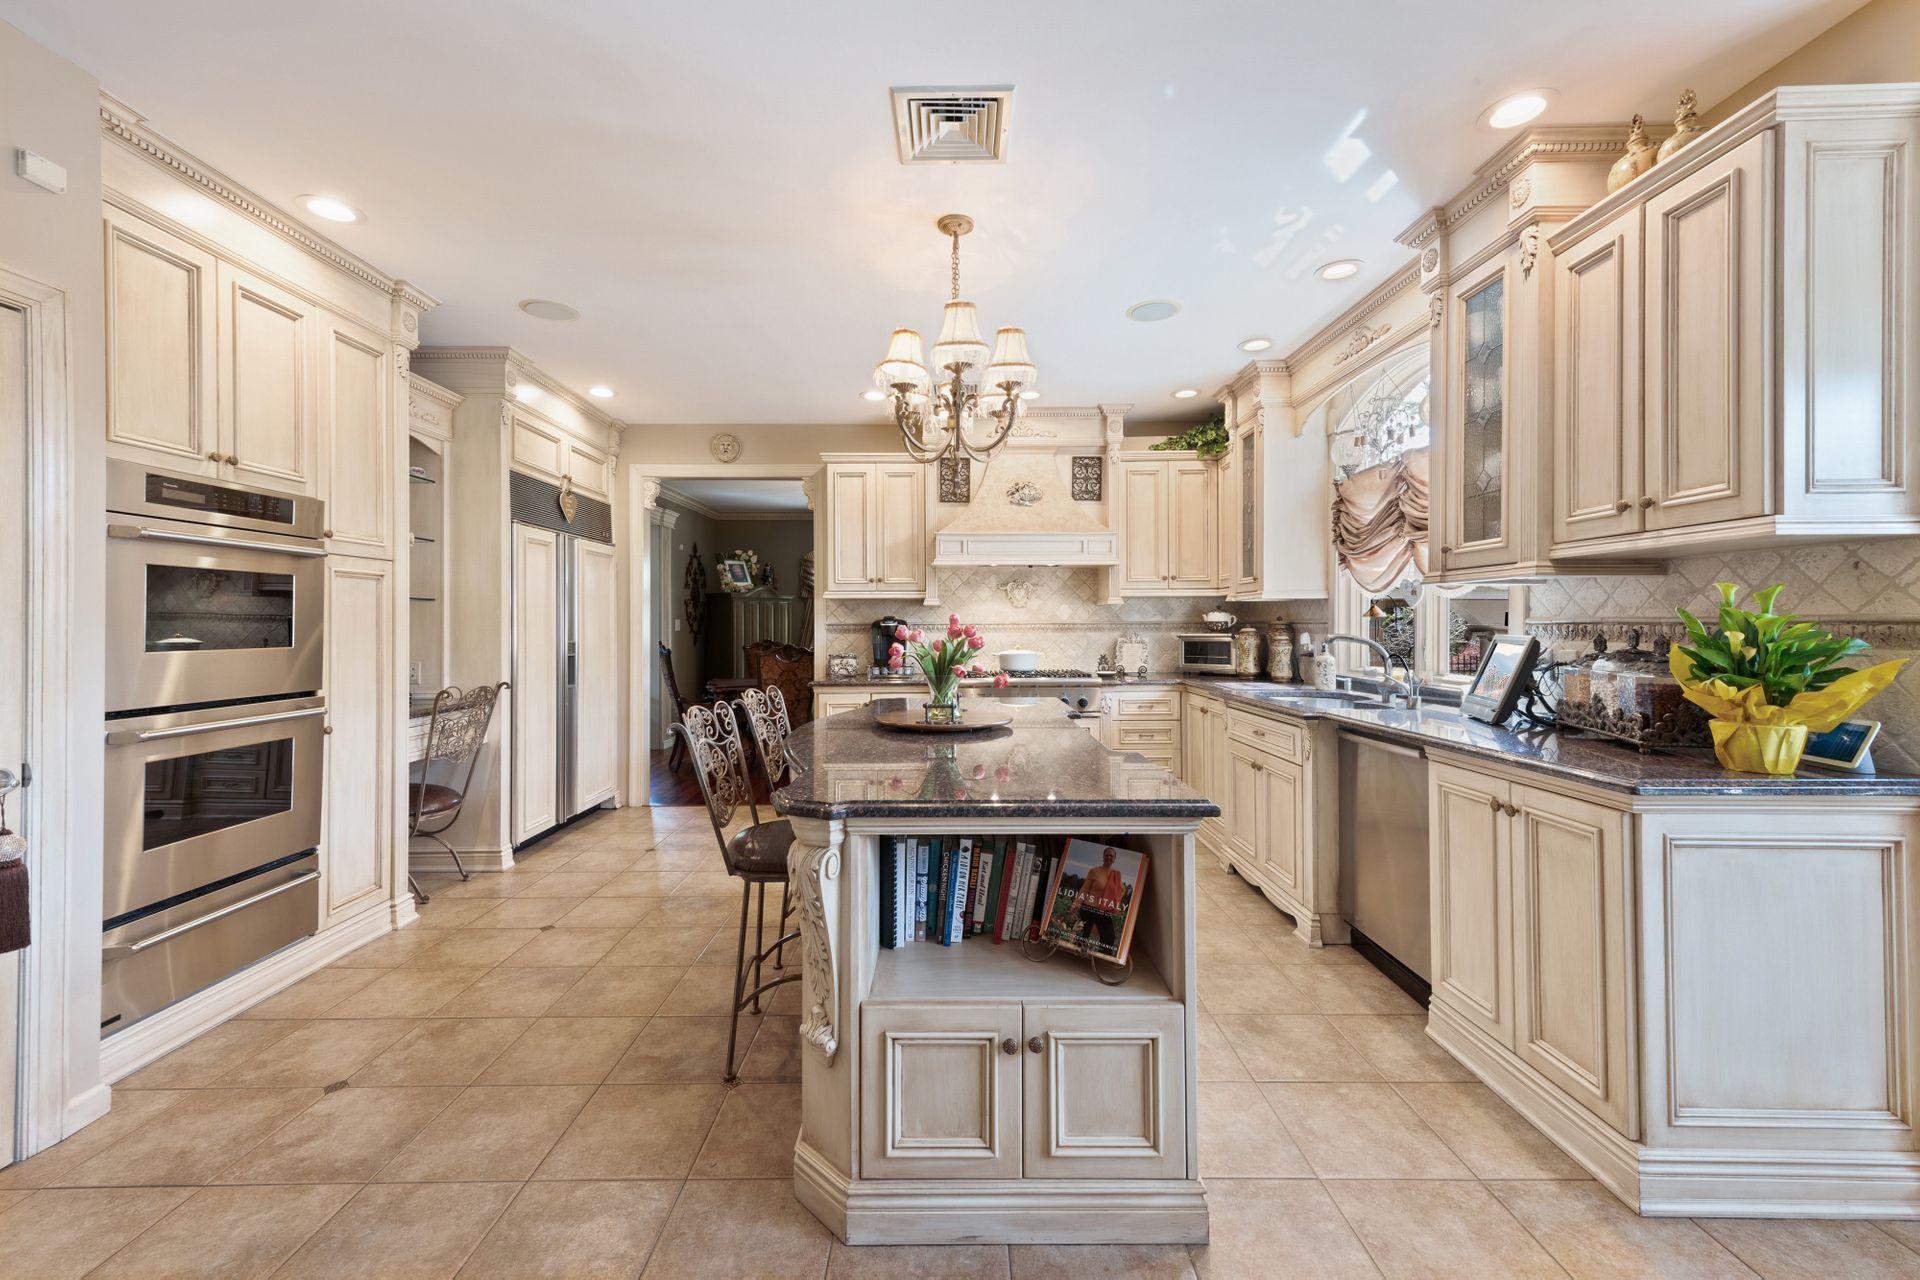 25 Ottavio Promenade Staten Island Ny 10307 Mls 1128393 Interior Design Kitchen Kitchen Design Built In Bookcase